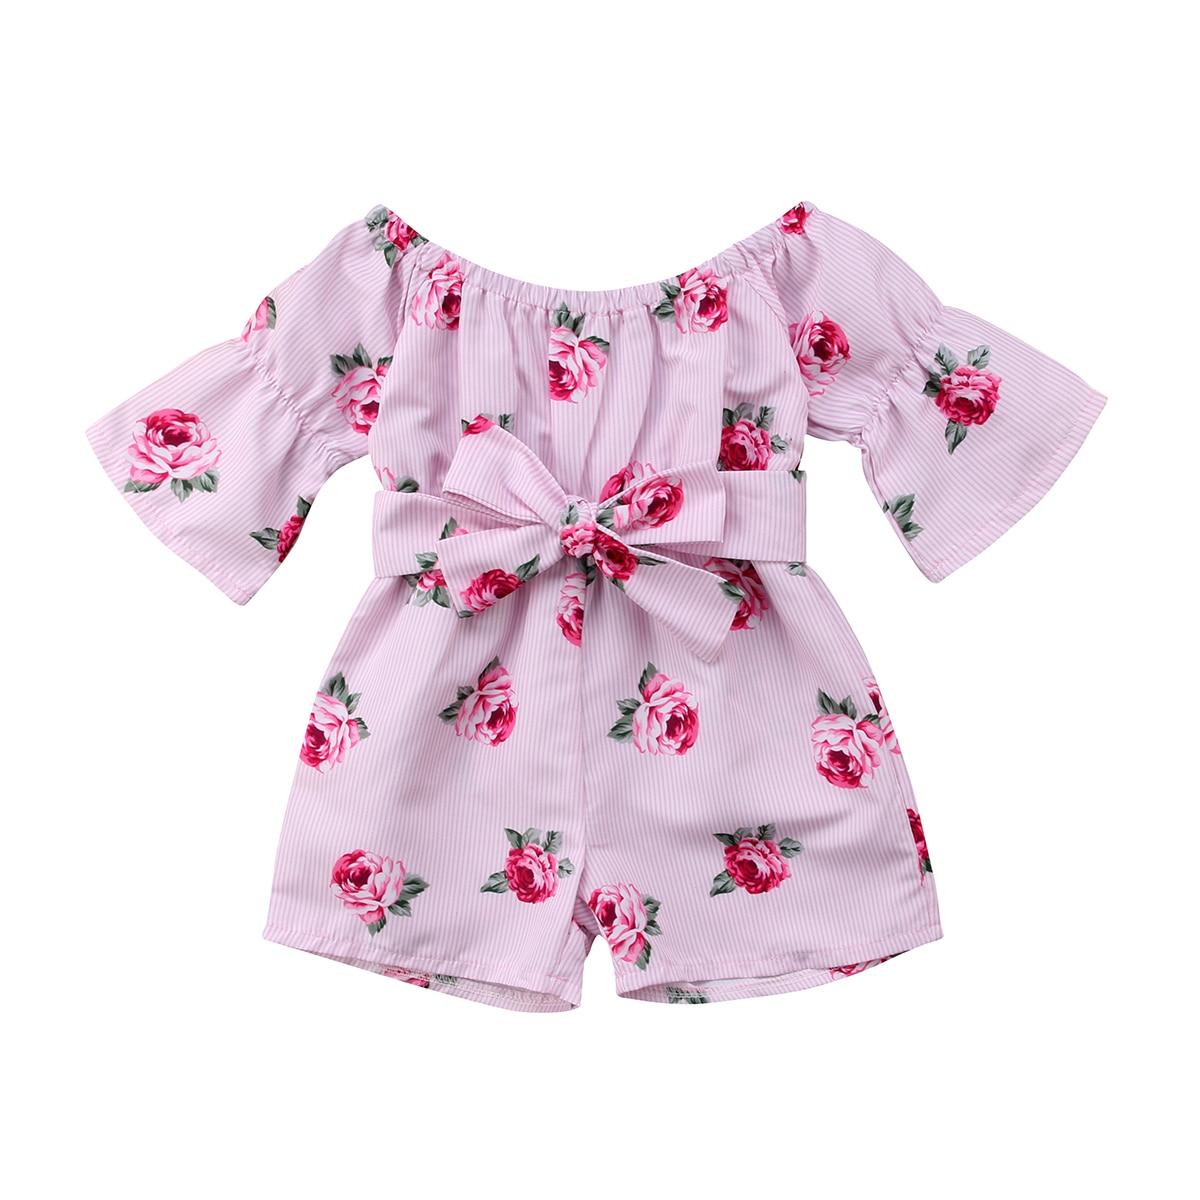 Pudcoco Summer New Kid Baby Girls Off Shoulder   Romper   Sunsuit Children Flower Girls Clothing